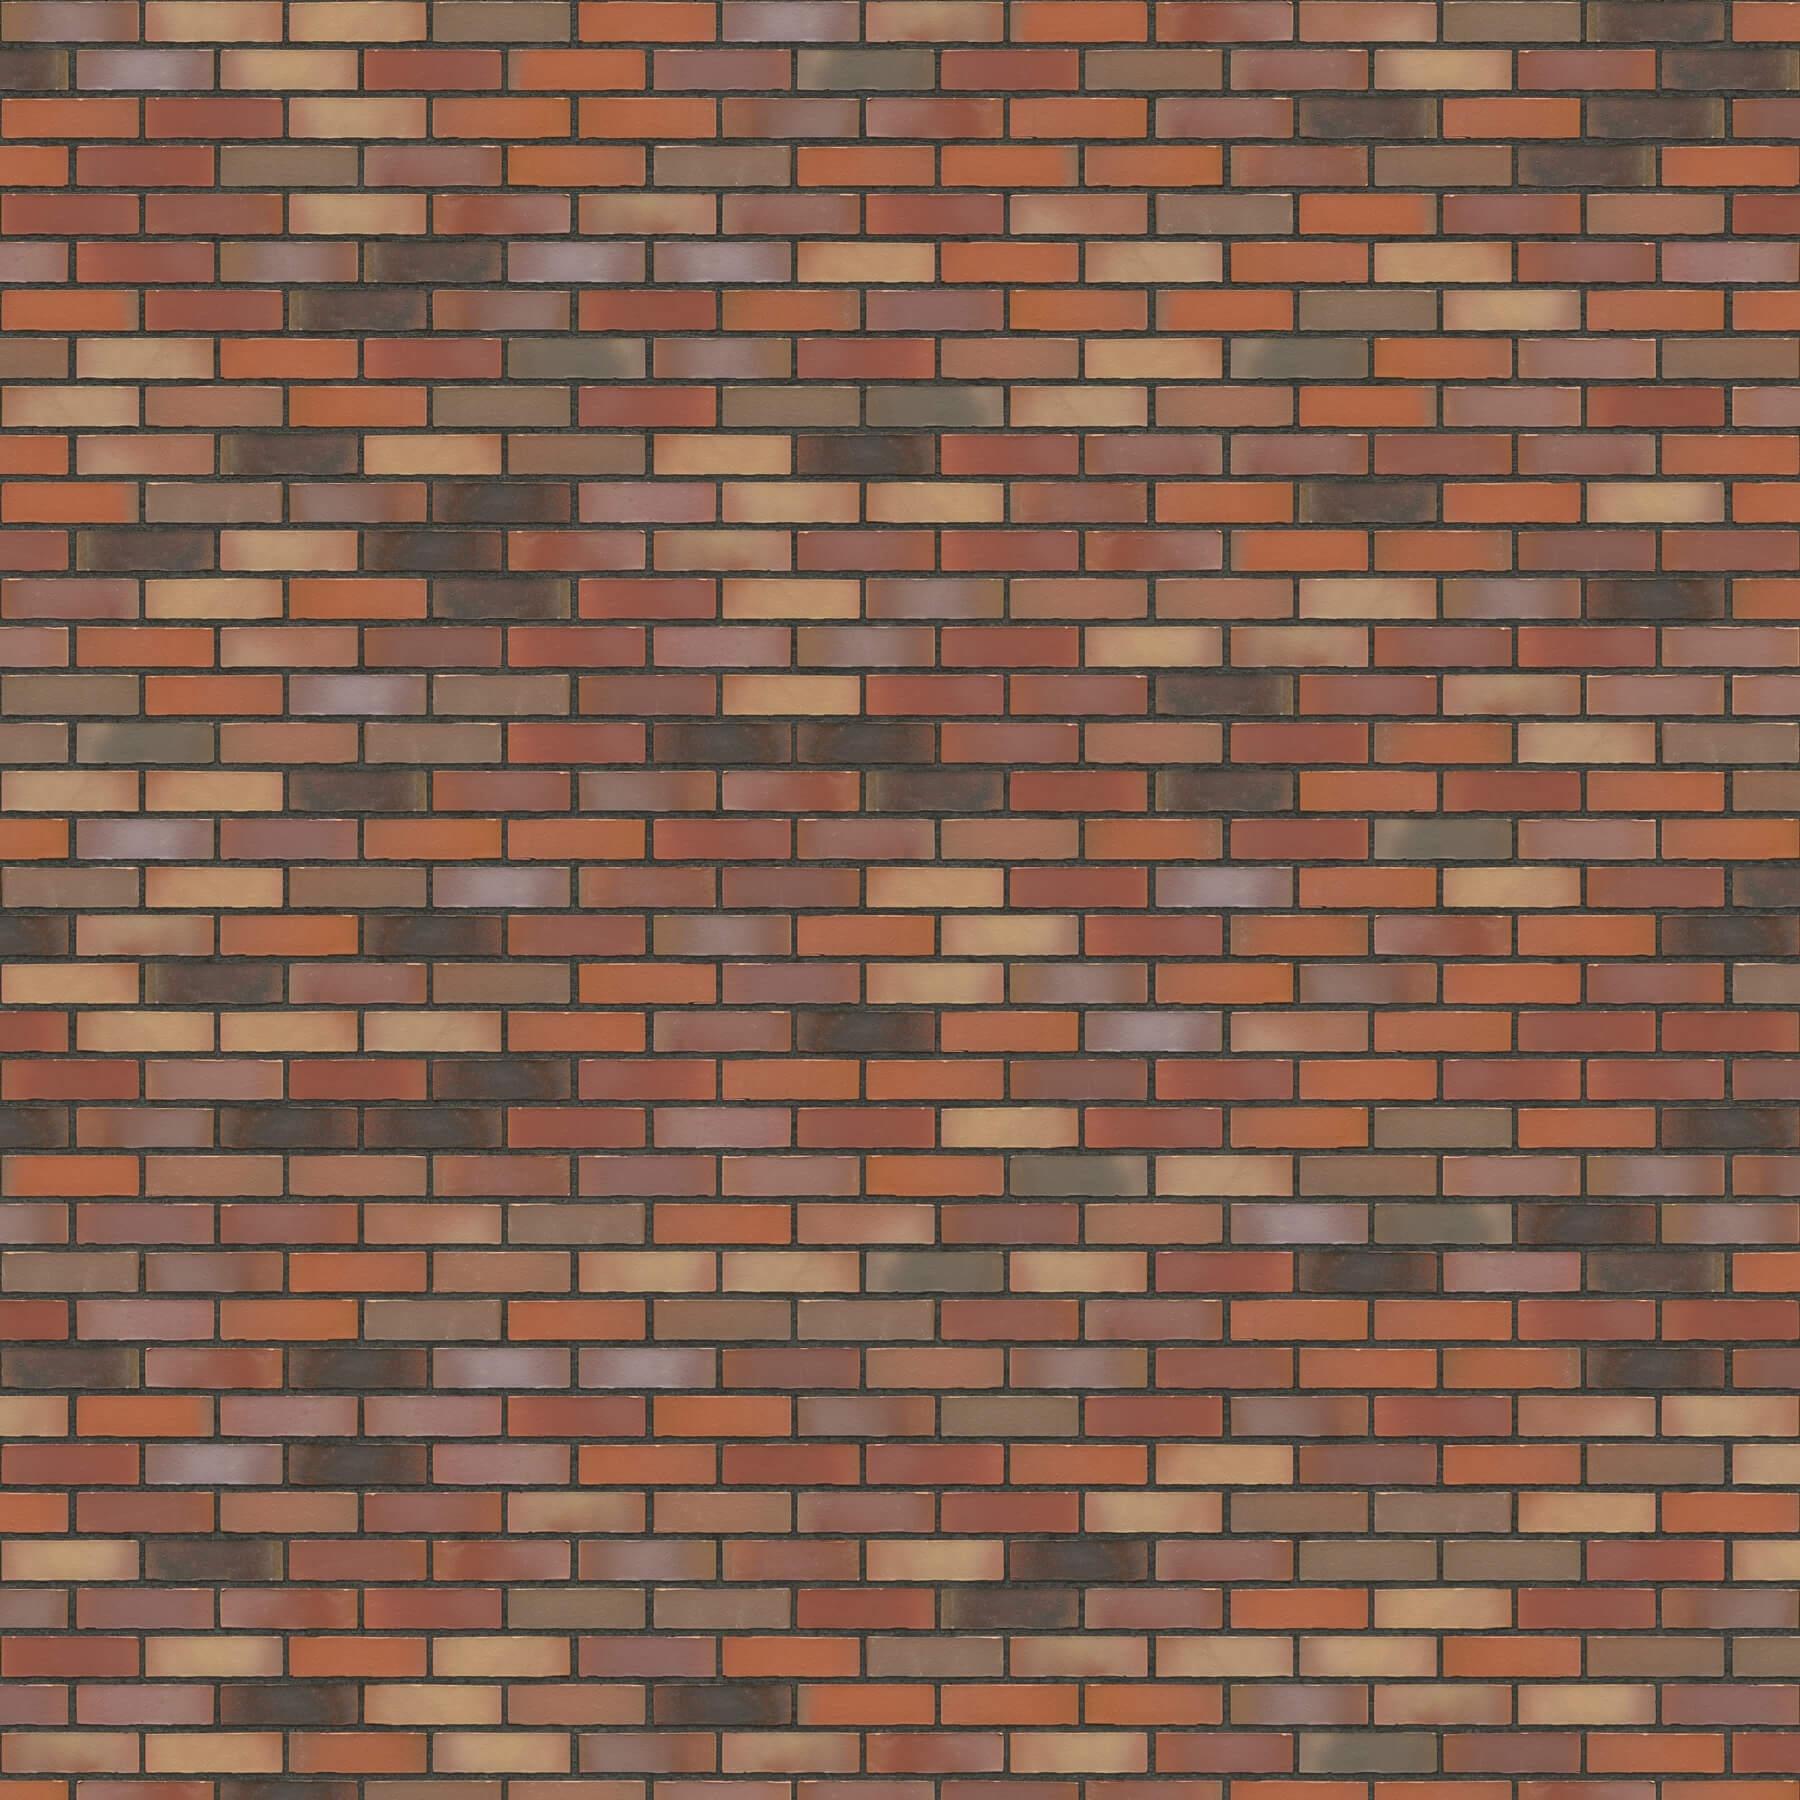 Puna-cigla-FeldHaus-Klinker-brick-house-beograd-nf-k-991-Antracit Fuga